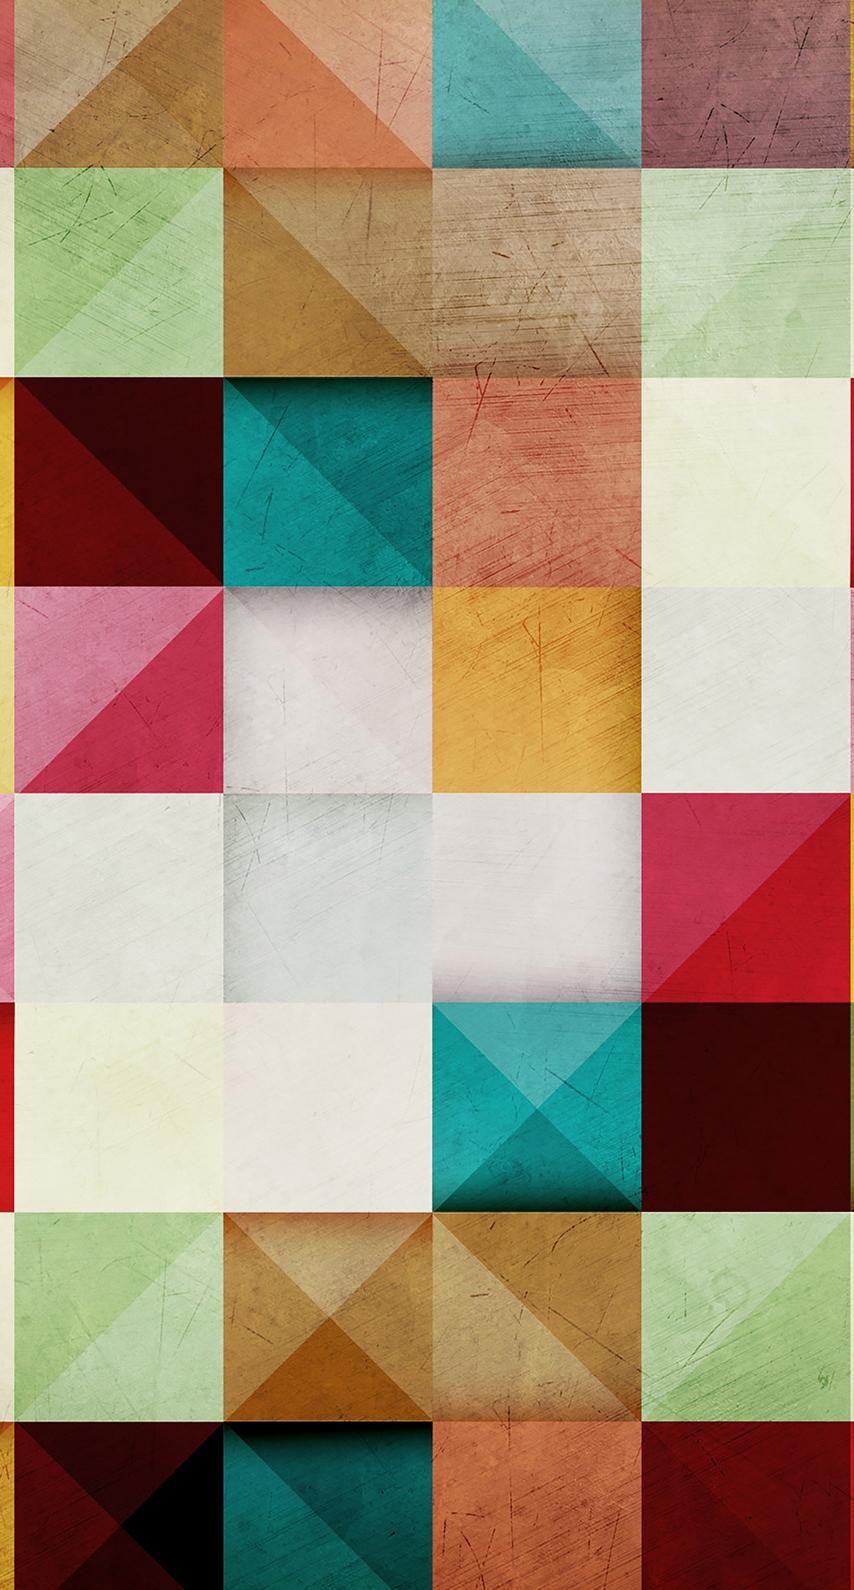 wave, graphic, paper, design, background, wallpaper, illustration, decoration, fabric, square, seamless, textile